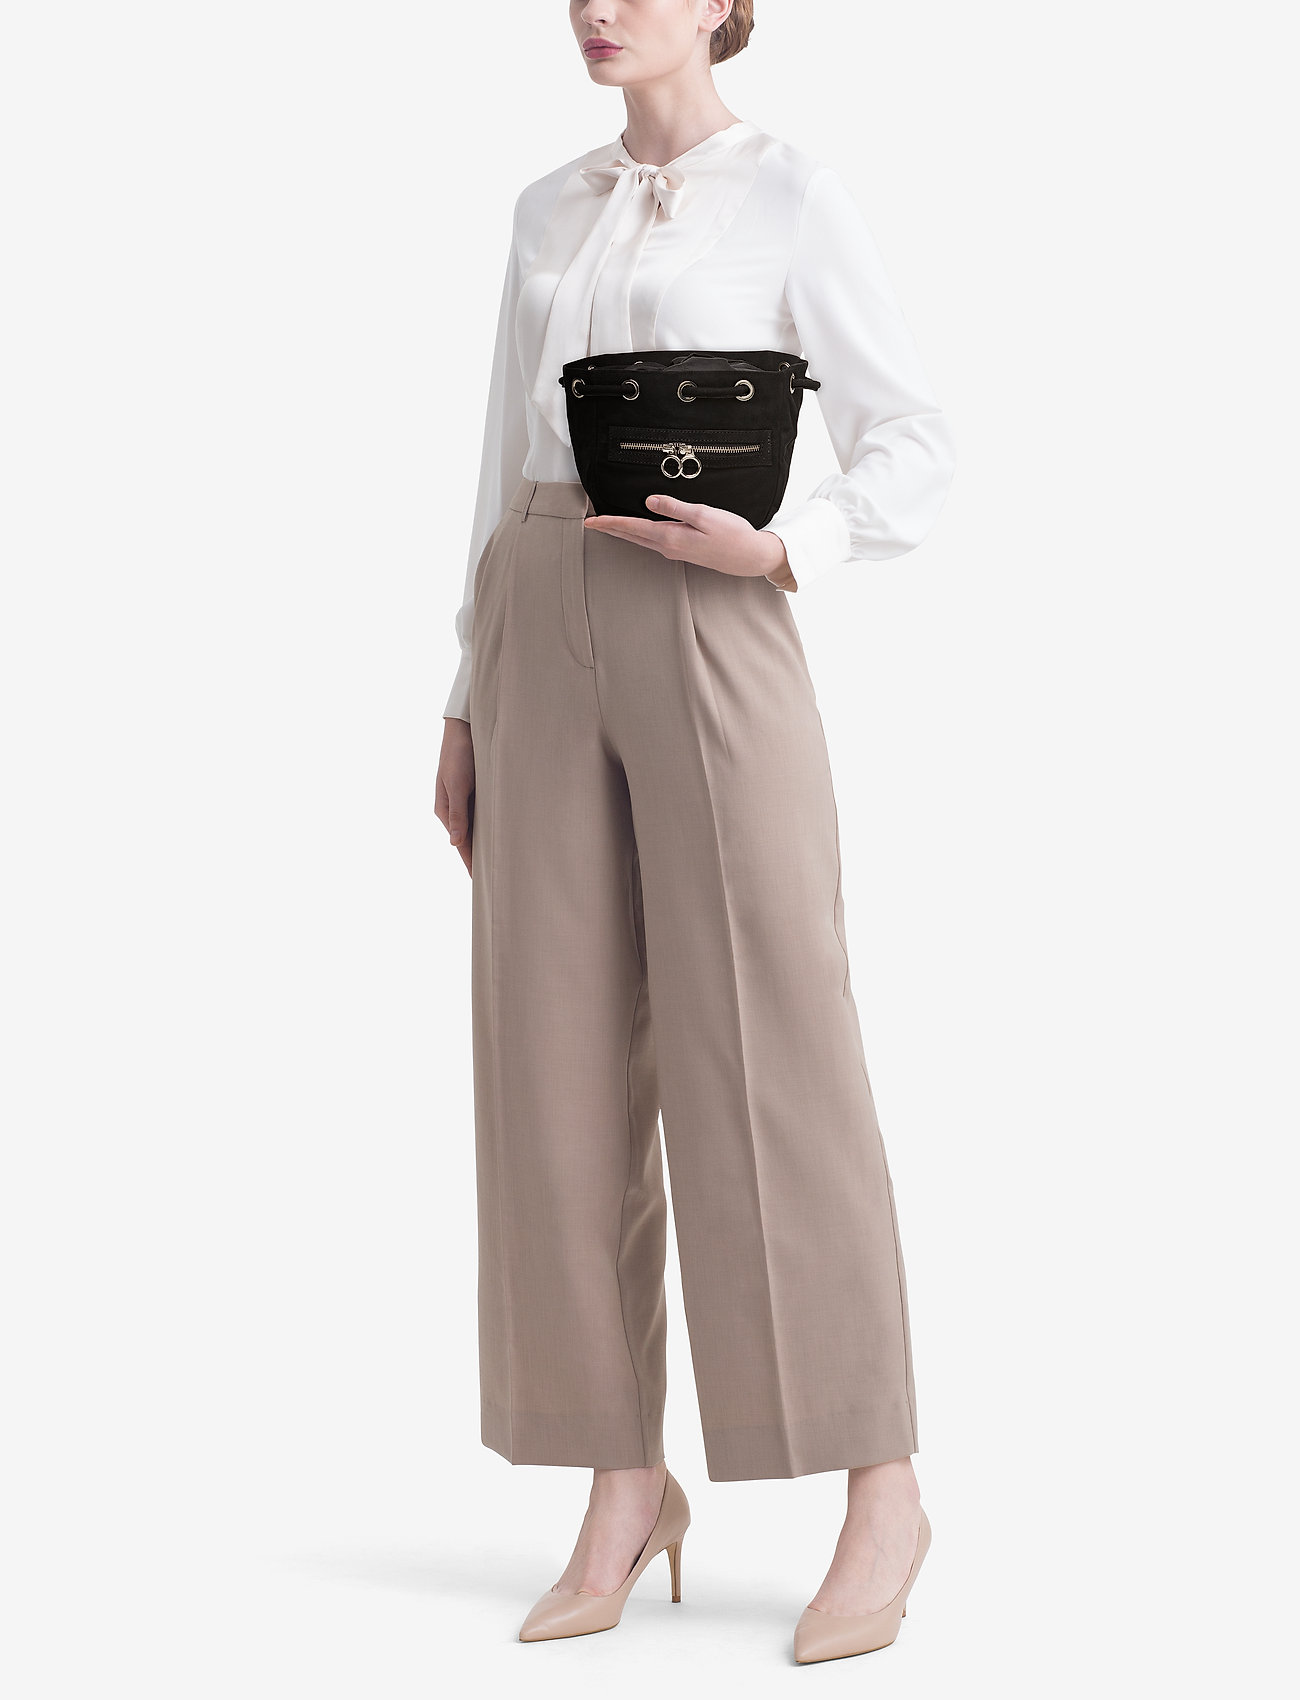 Gestuz Bow mini s bag MA18 - BLACK